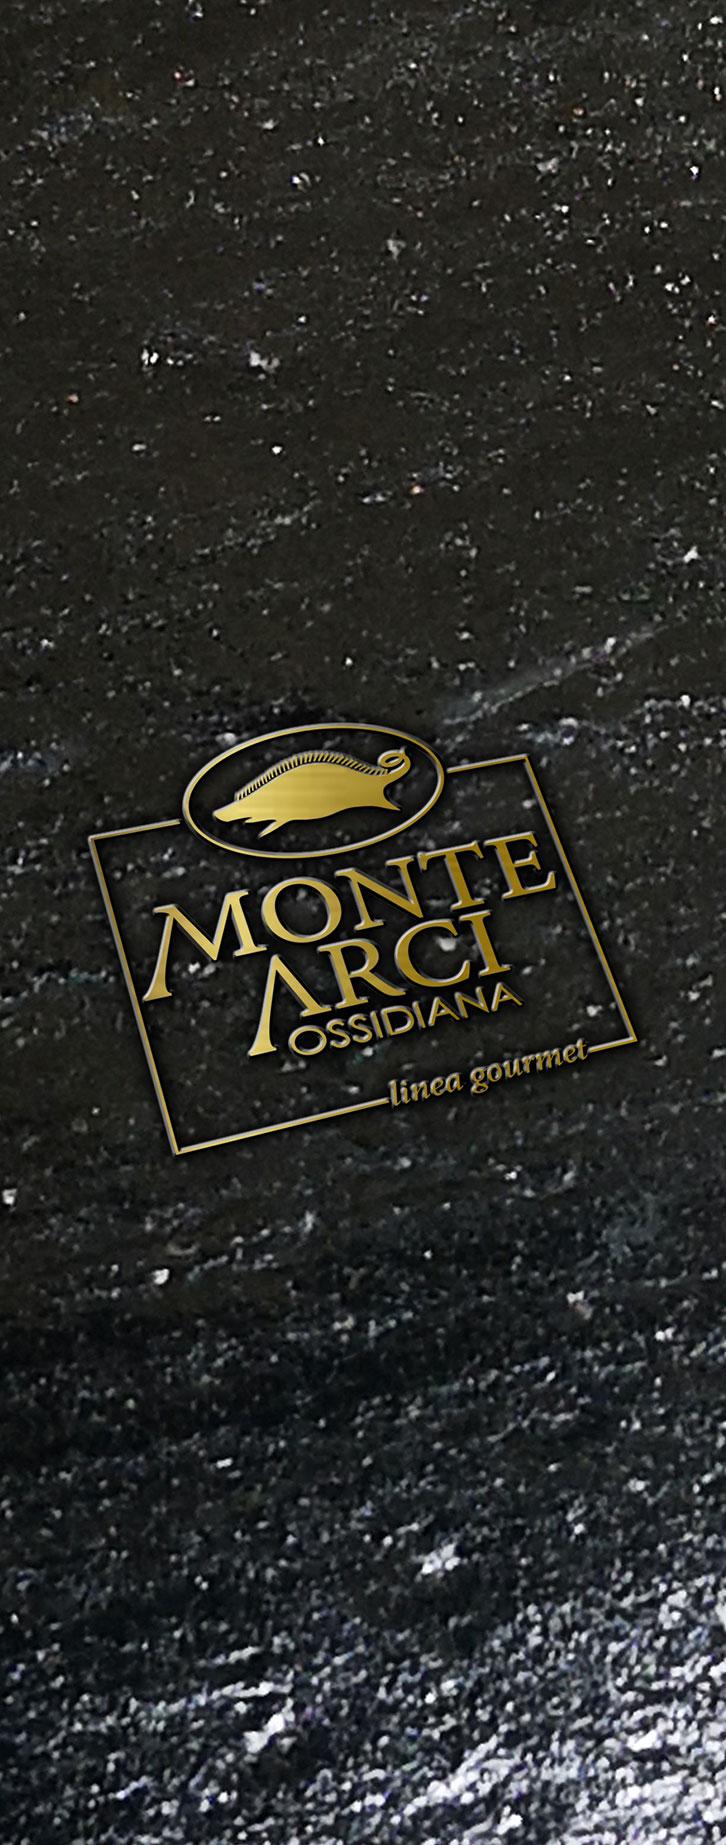 MONTE_ARCI_OSSIDIANA_VERT